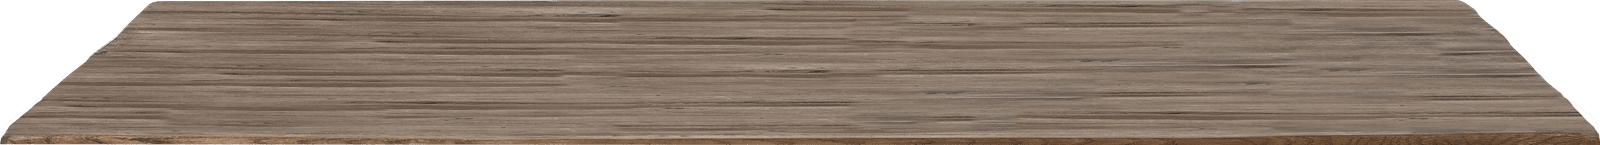 Masters - bartafel 160 x 140 cm - rvs 9x9